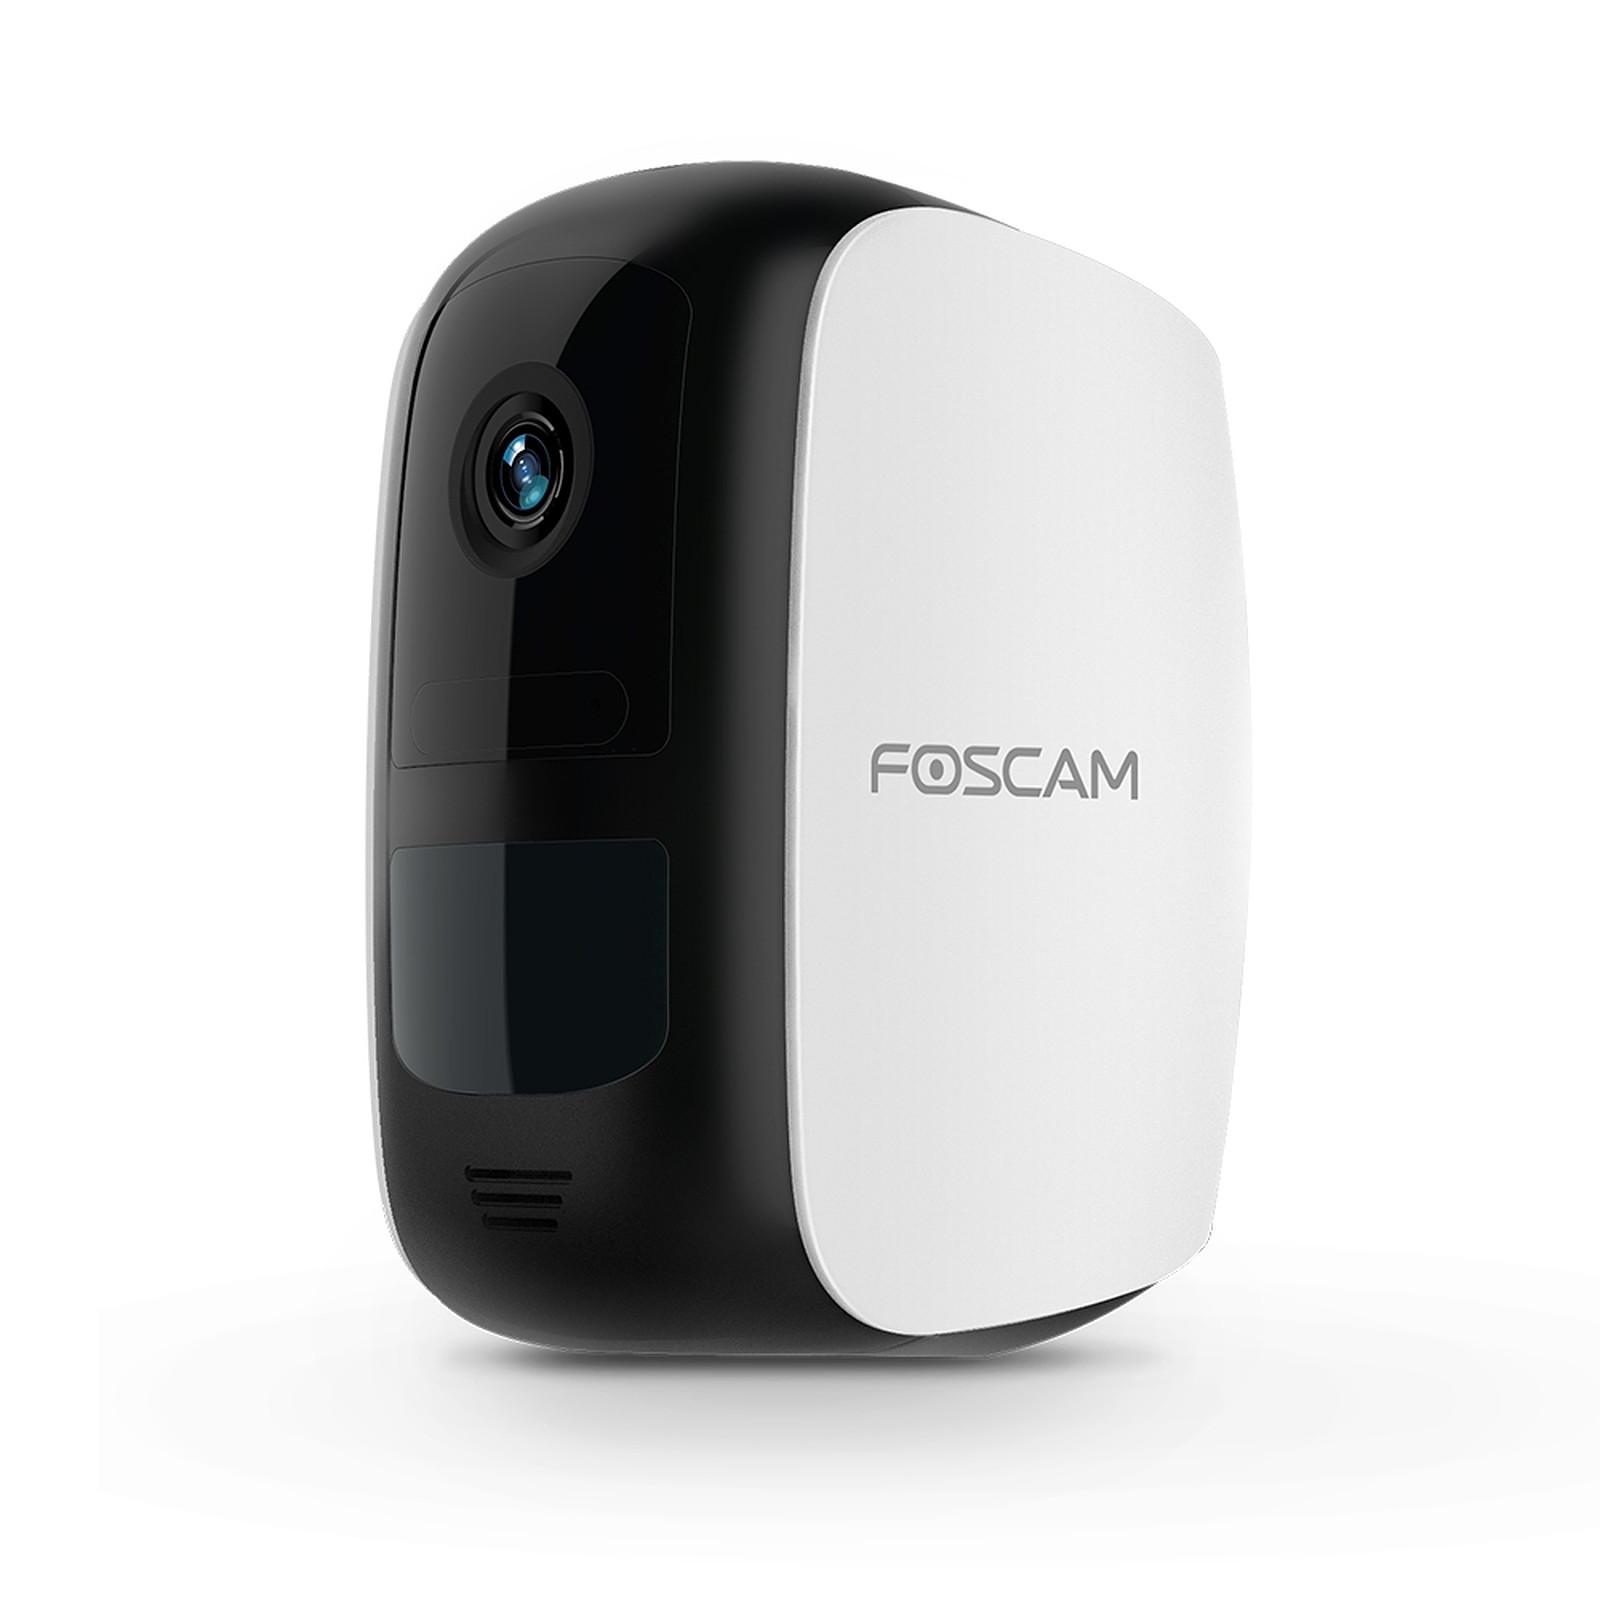 Foscam Caméra autonome 100% sans fil - B1